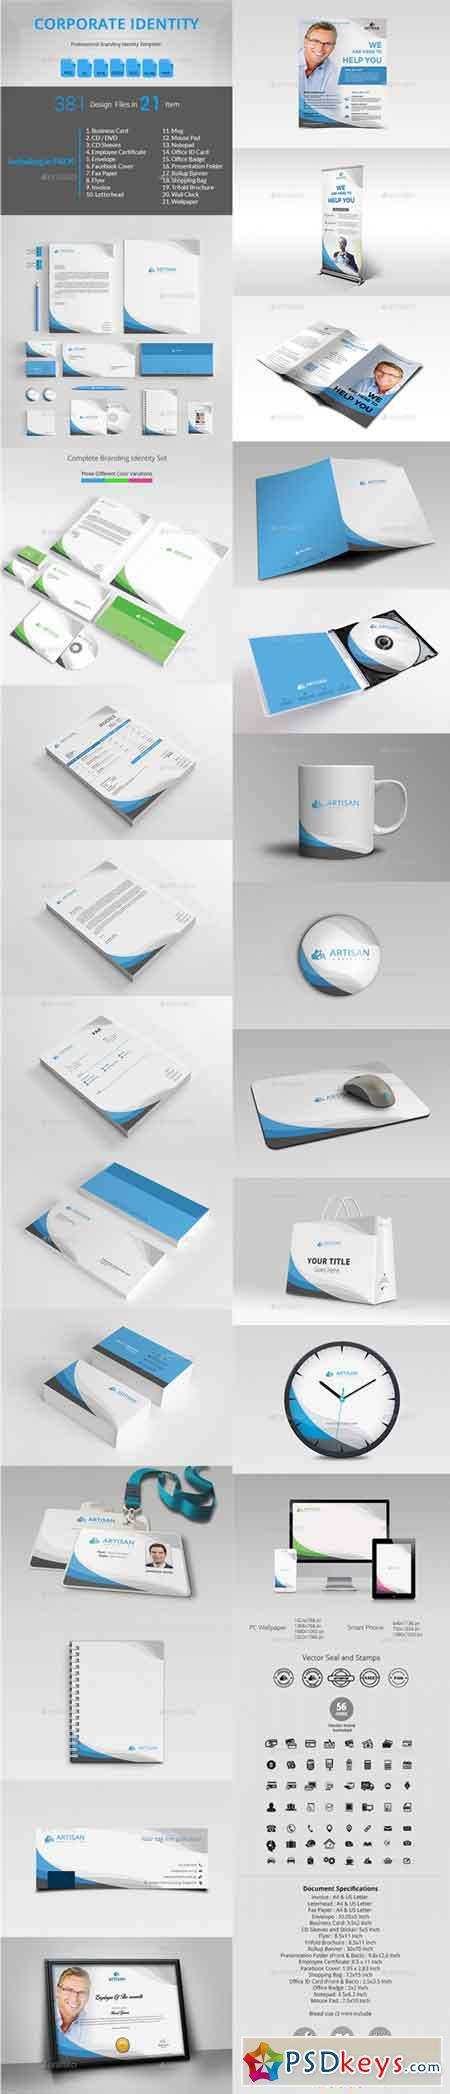 Corporate Identity 13115538